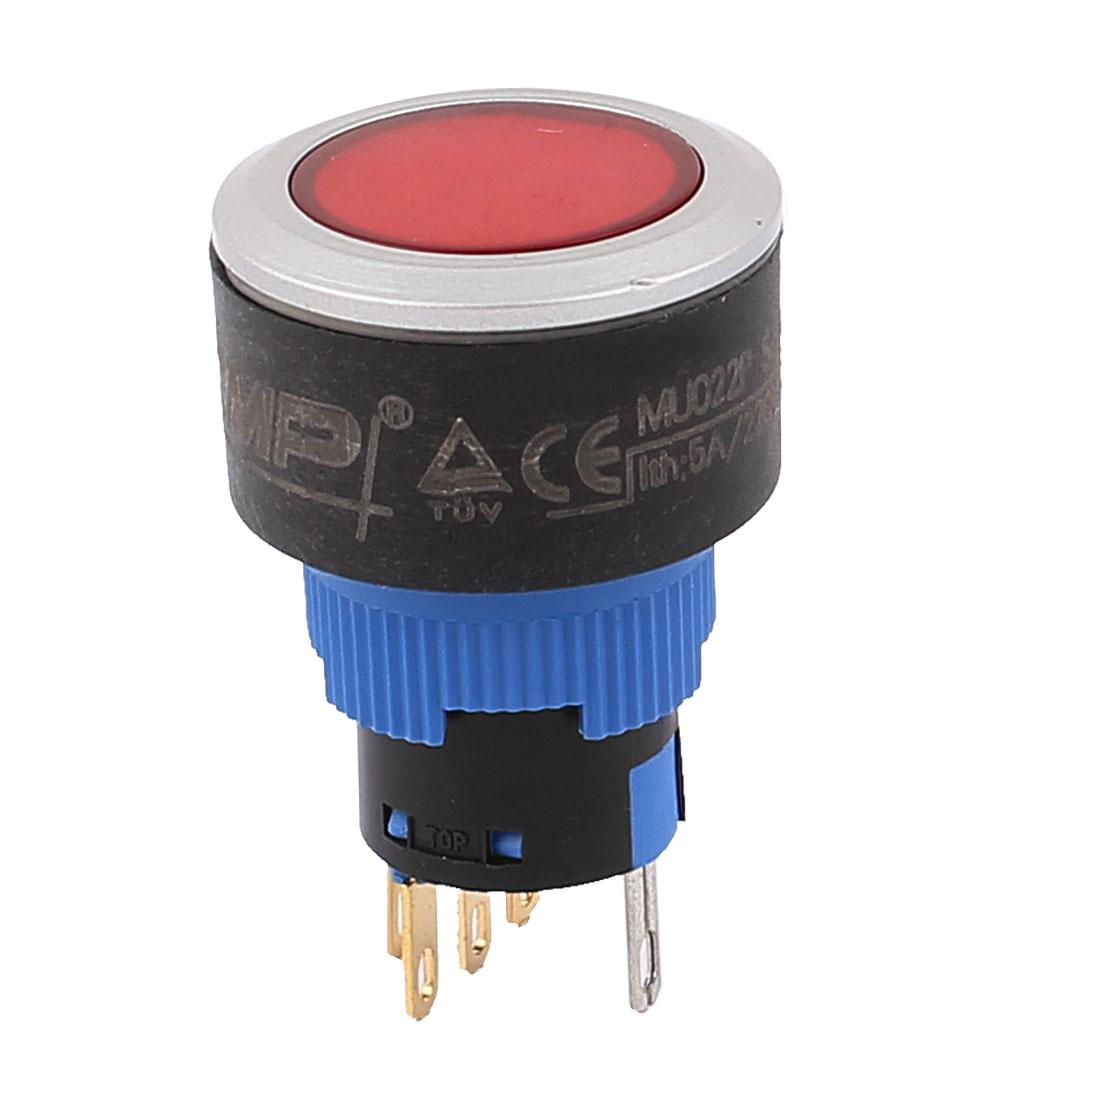 15.5mm DC 12V Red LED Light 5 Pin SPDT Momentary Push Button Switch